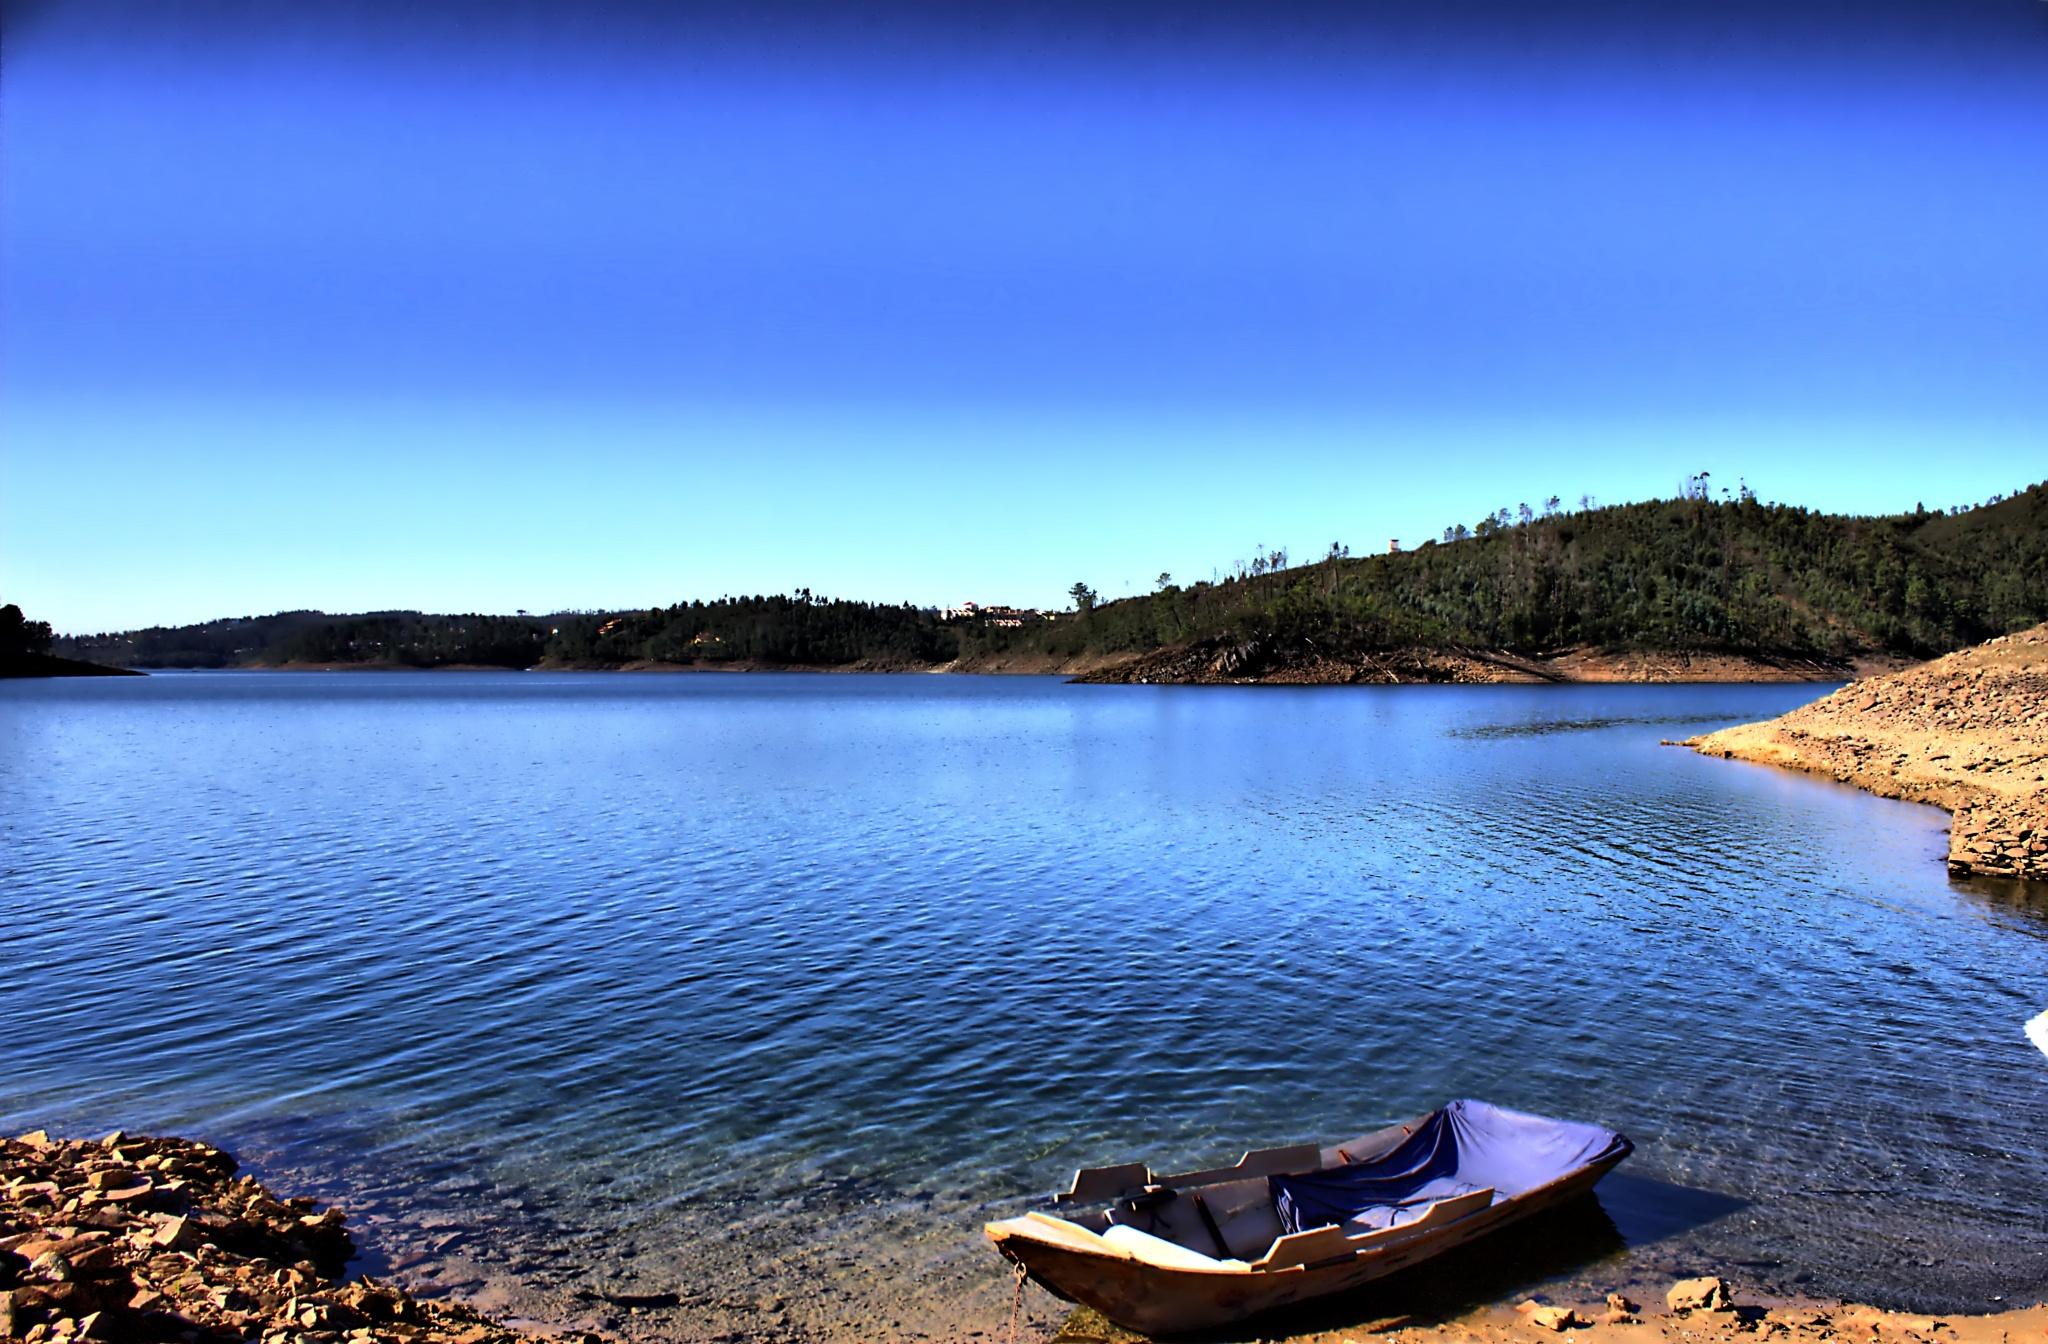 Let's go fishing by Joaquim Gaspar